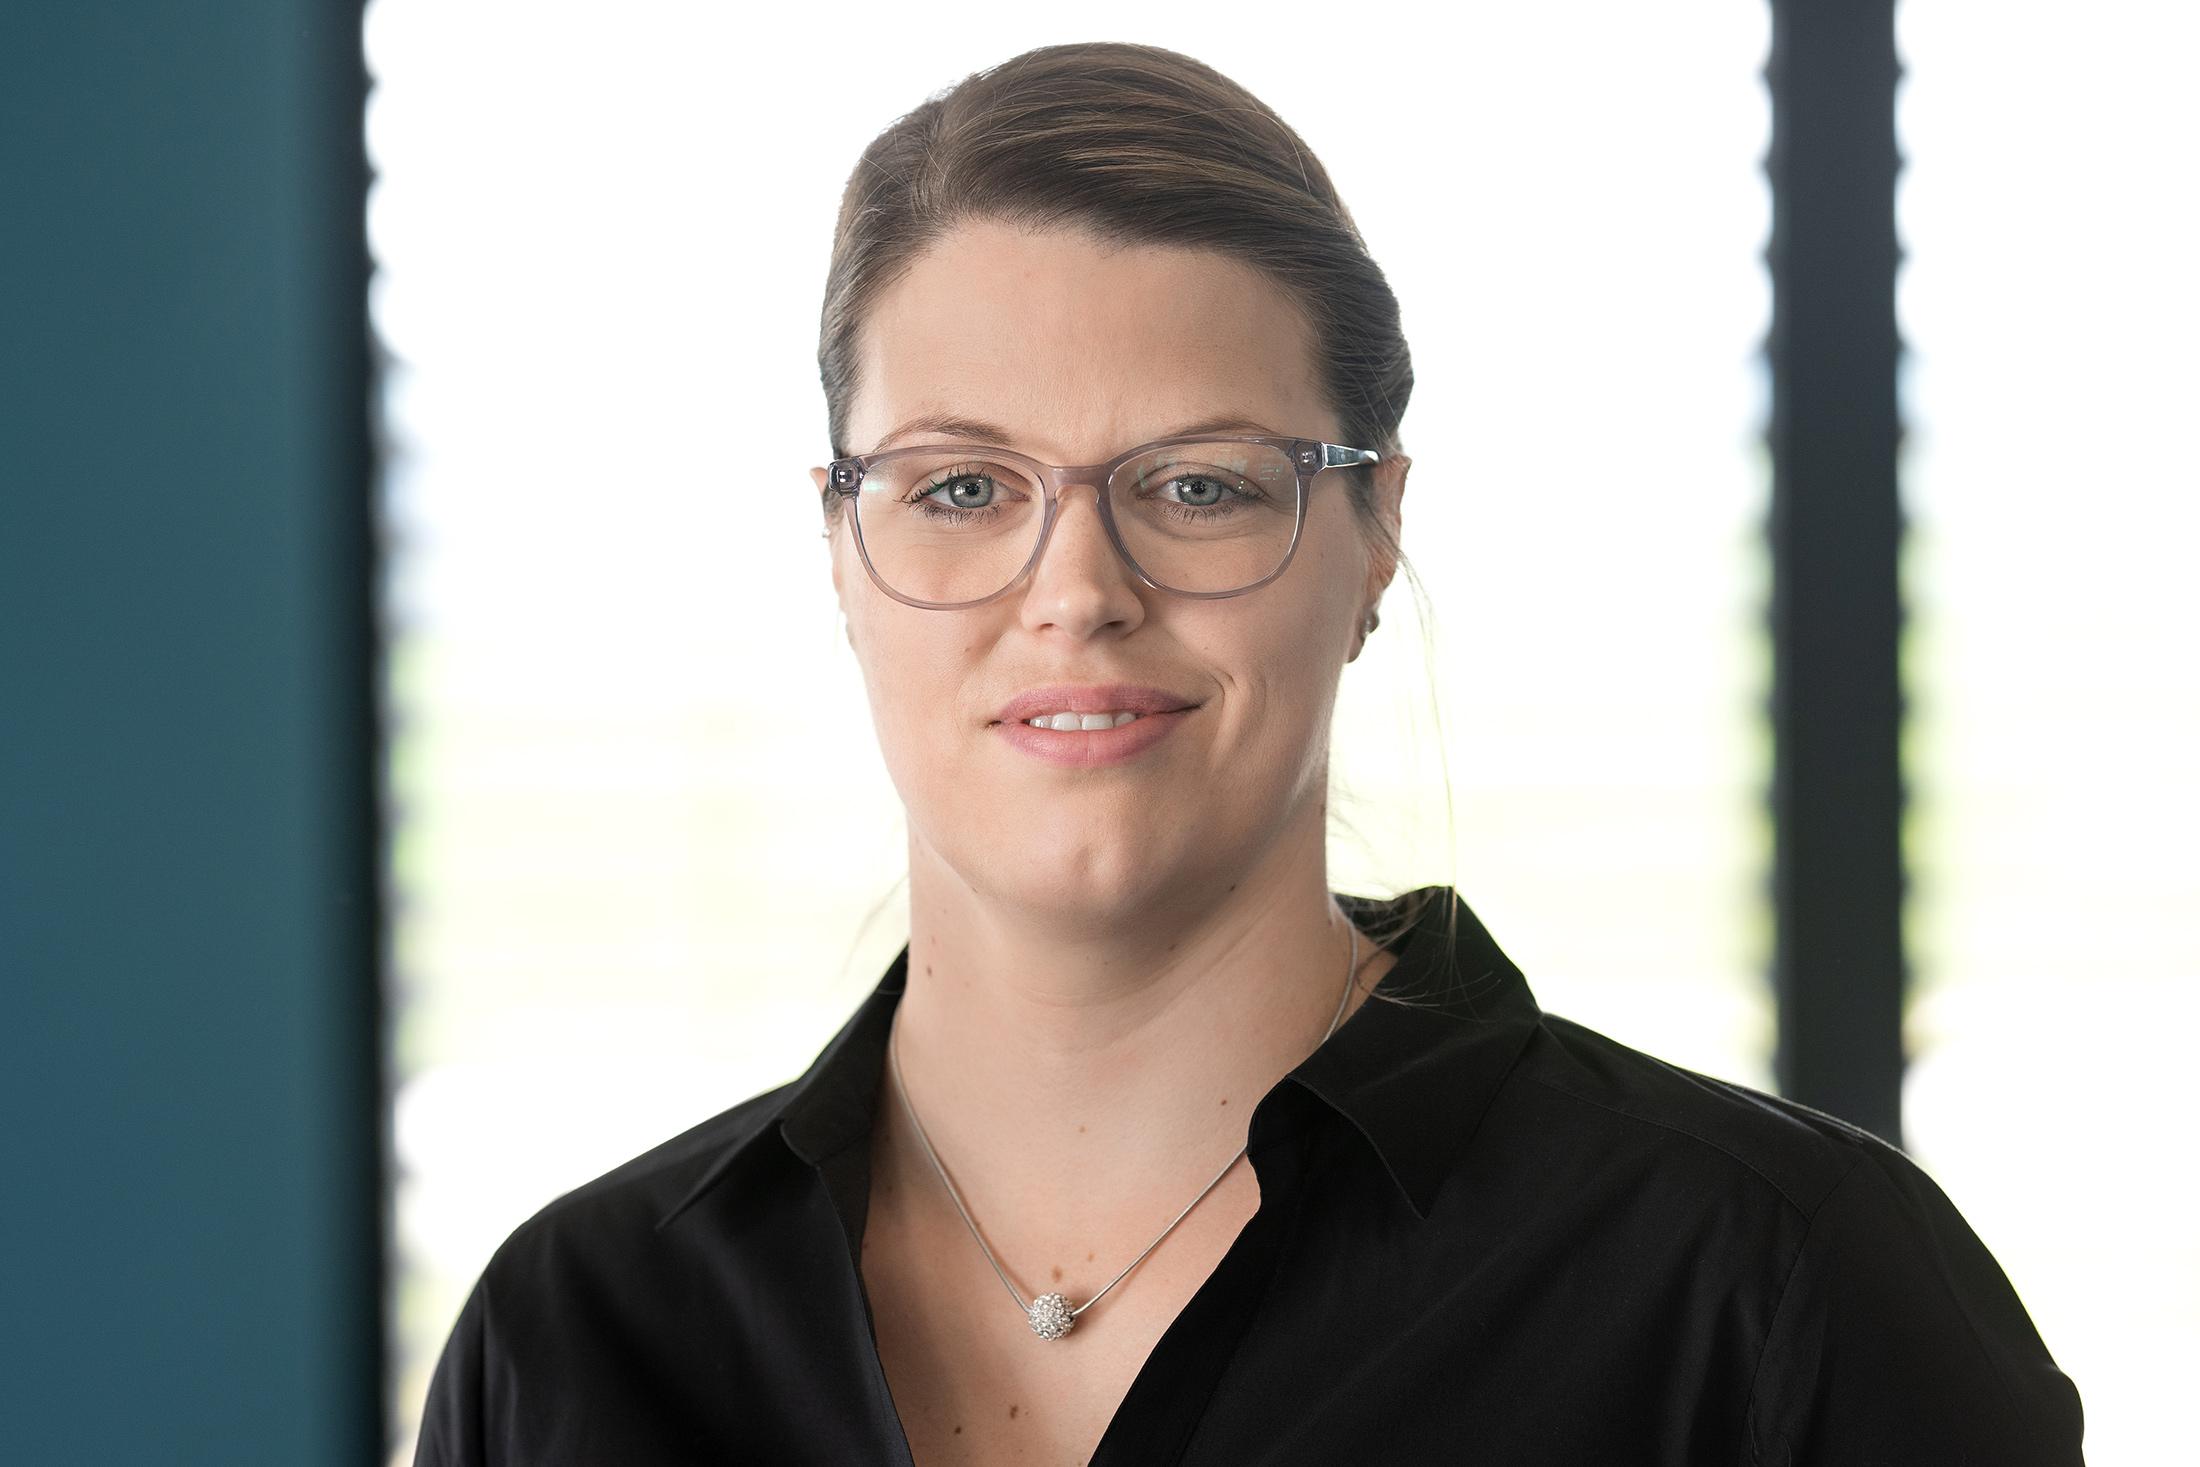 Tanja Kersting